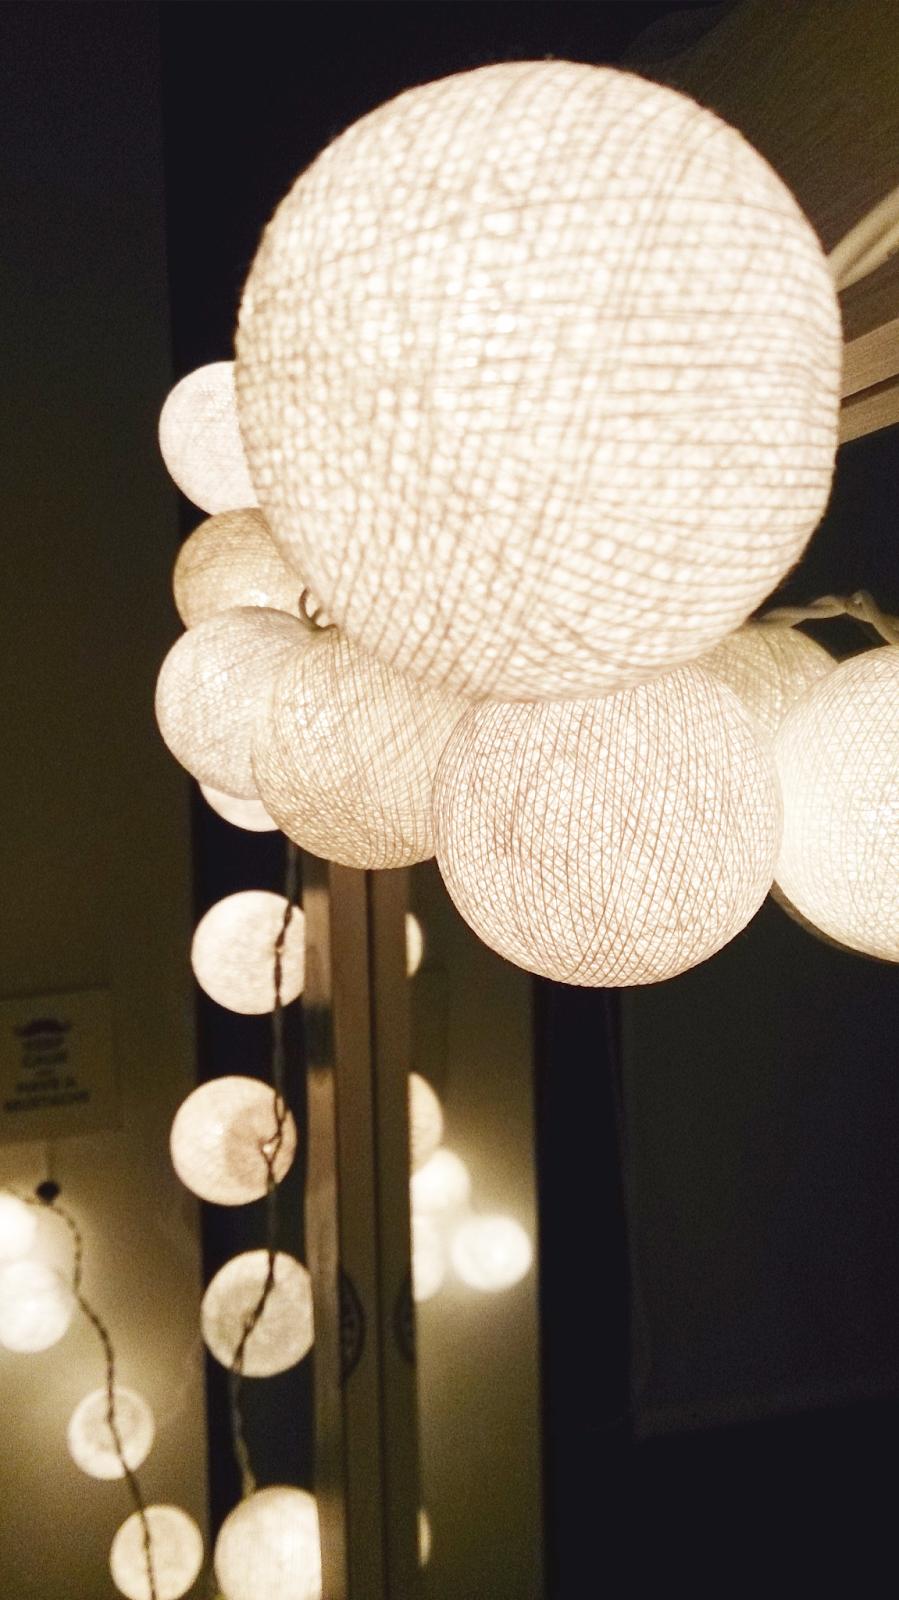 qule,cotton balls light,białe cotton balls w pokoju,DIY,inspiracje blog majsterkowanie,wnętrza,